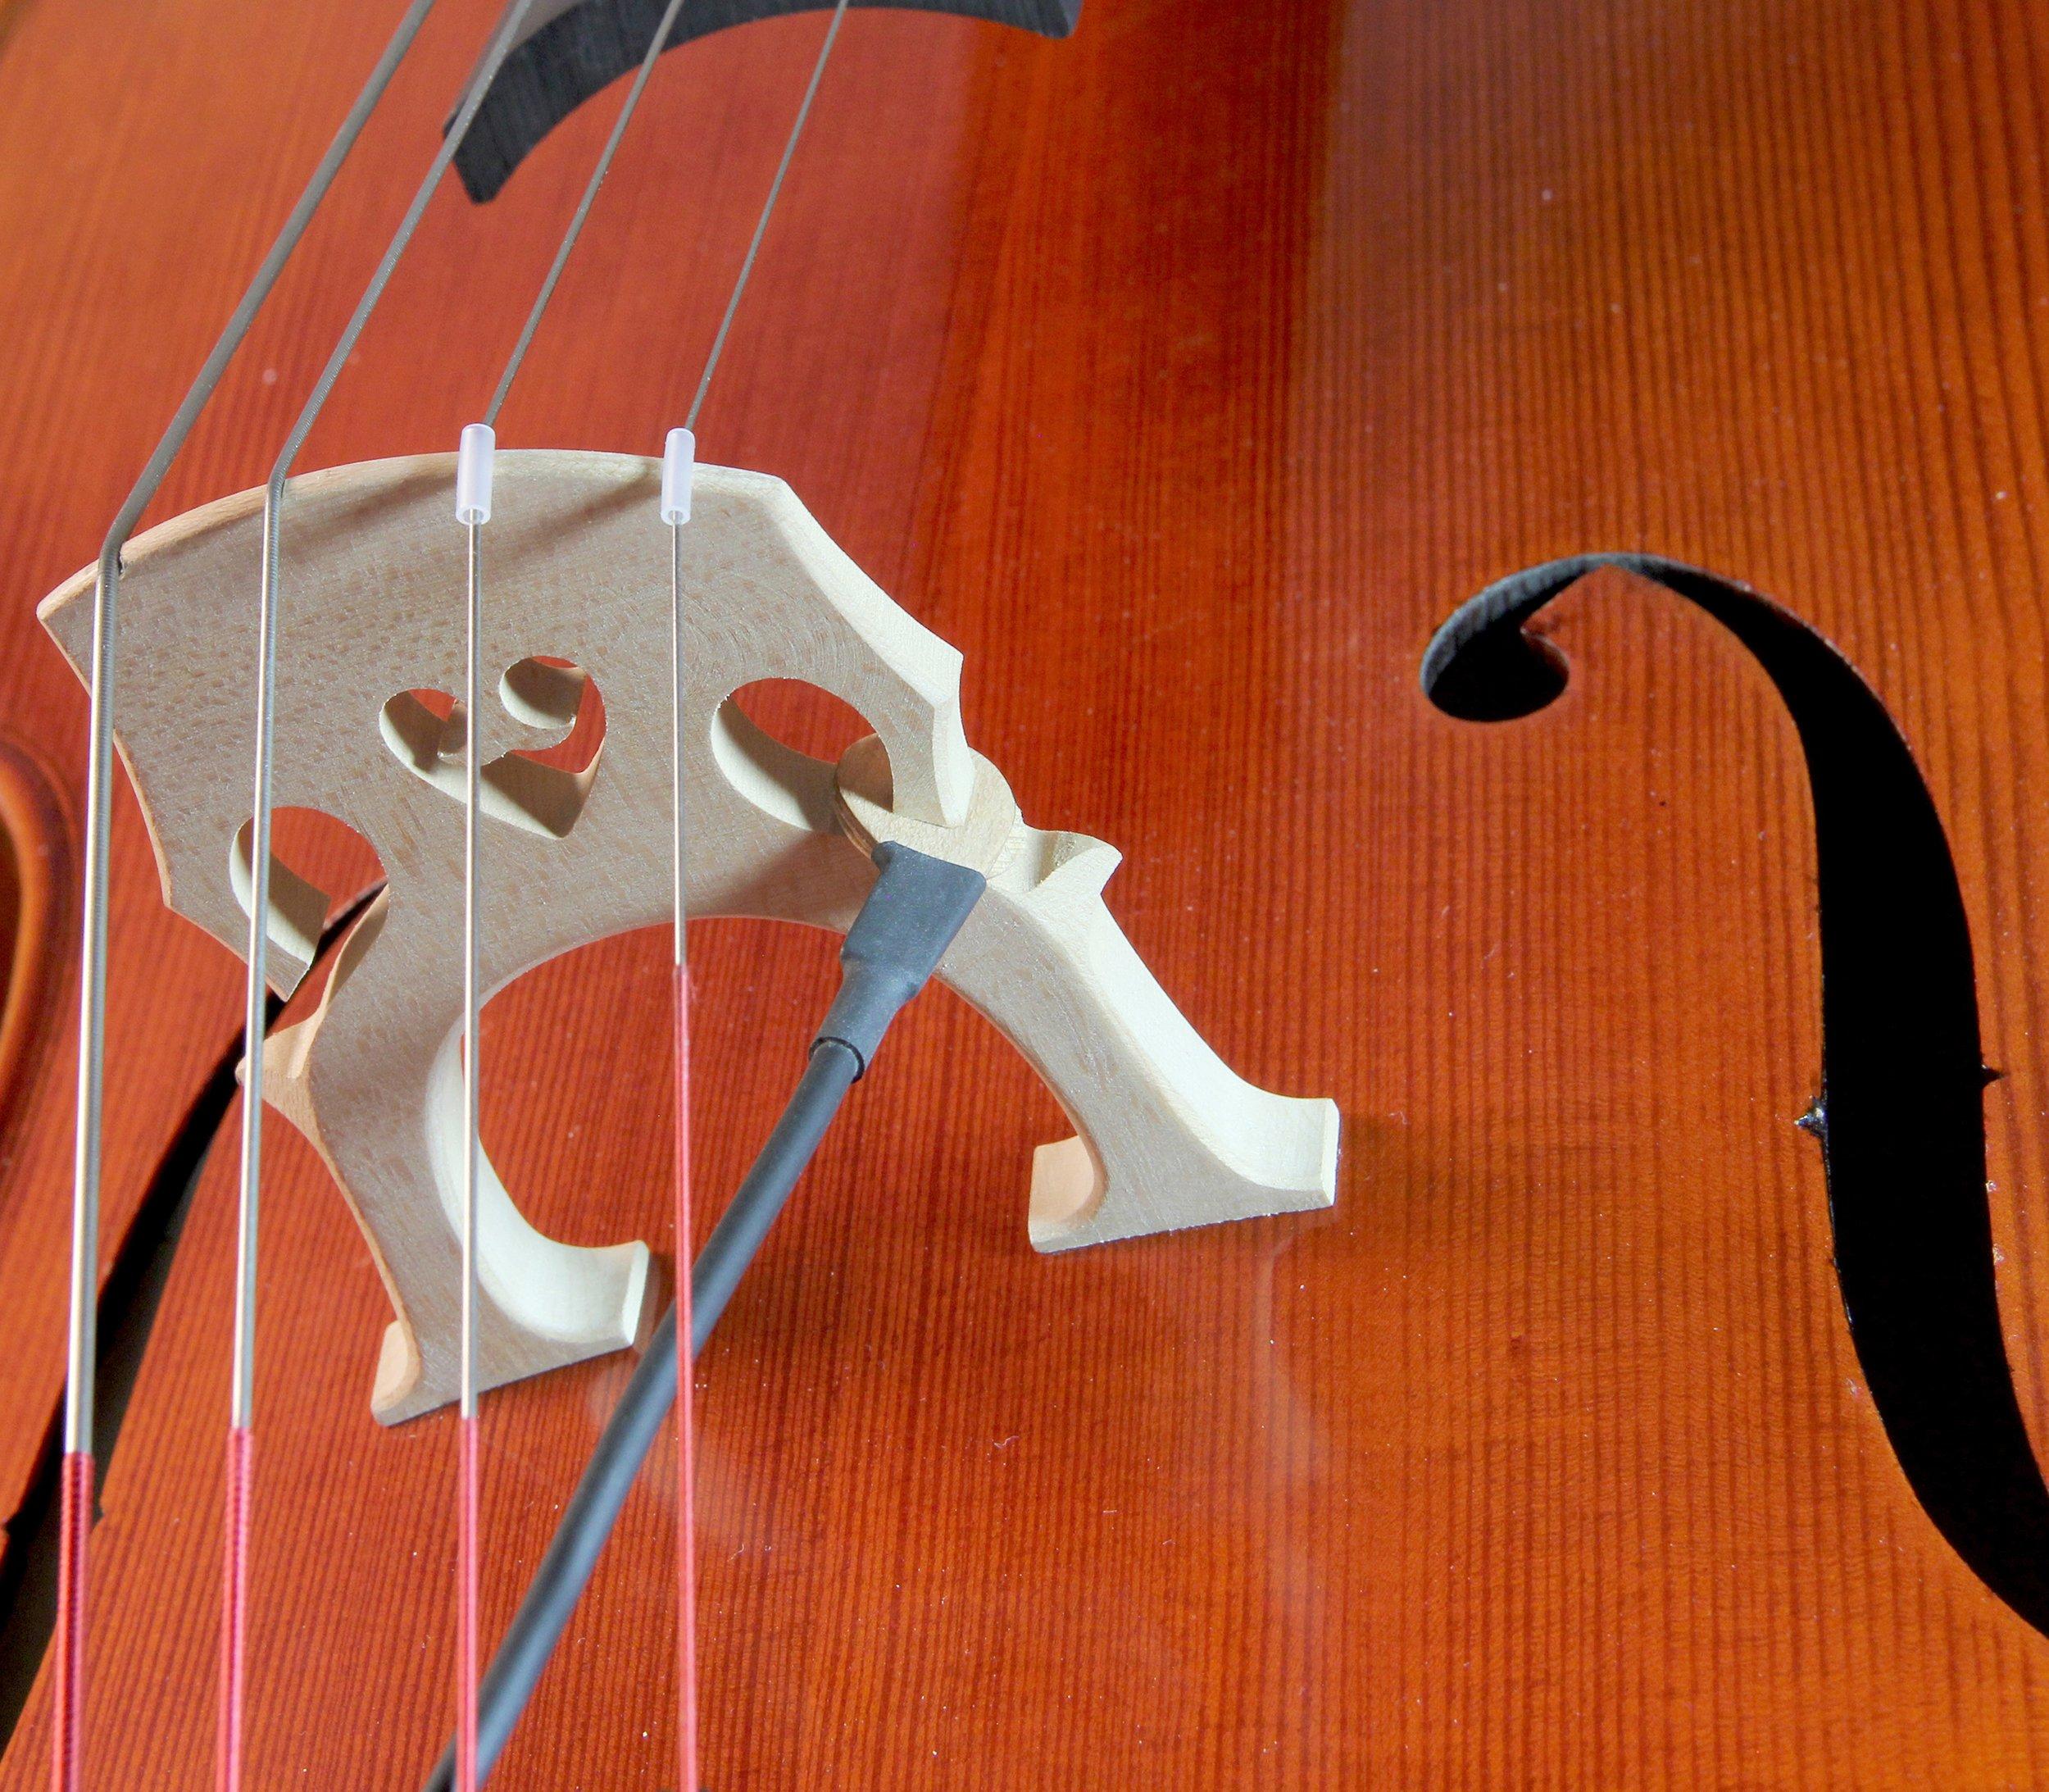 KNA VC-1 Portable Piezo Pickup for Cello by KNA Pickups (Image #4)